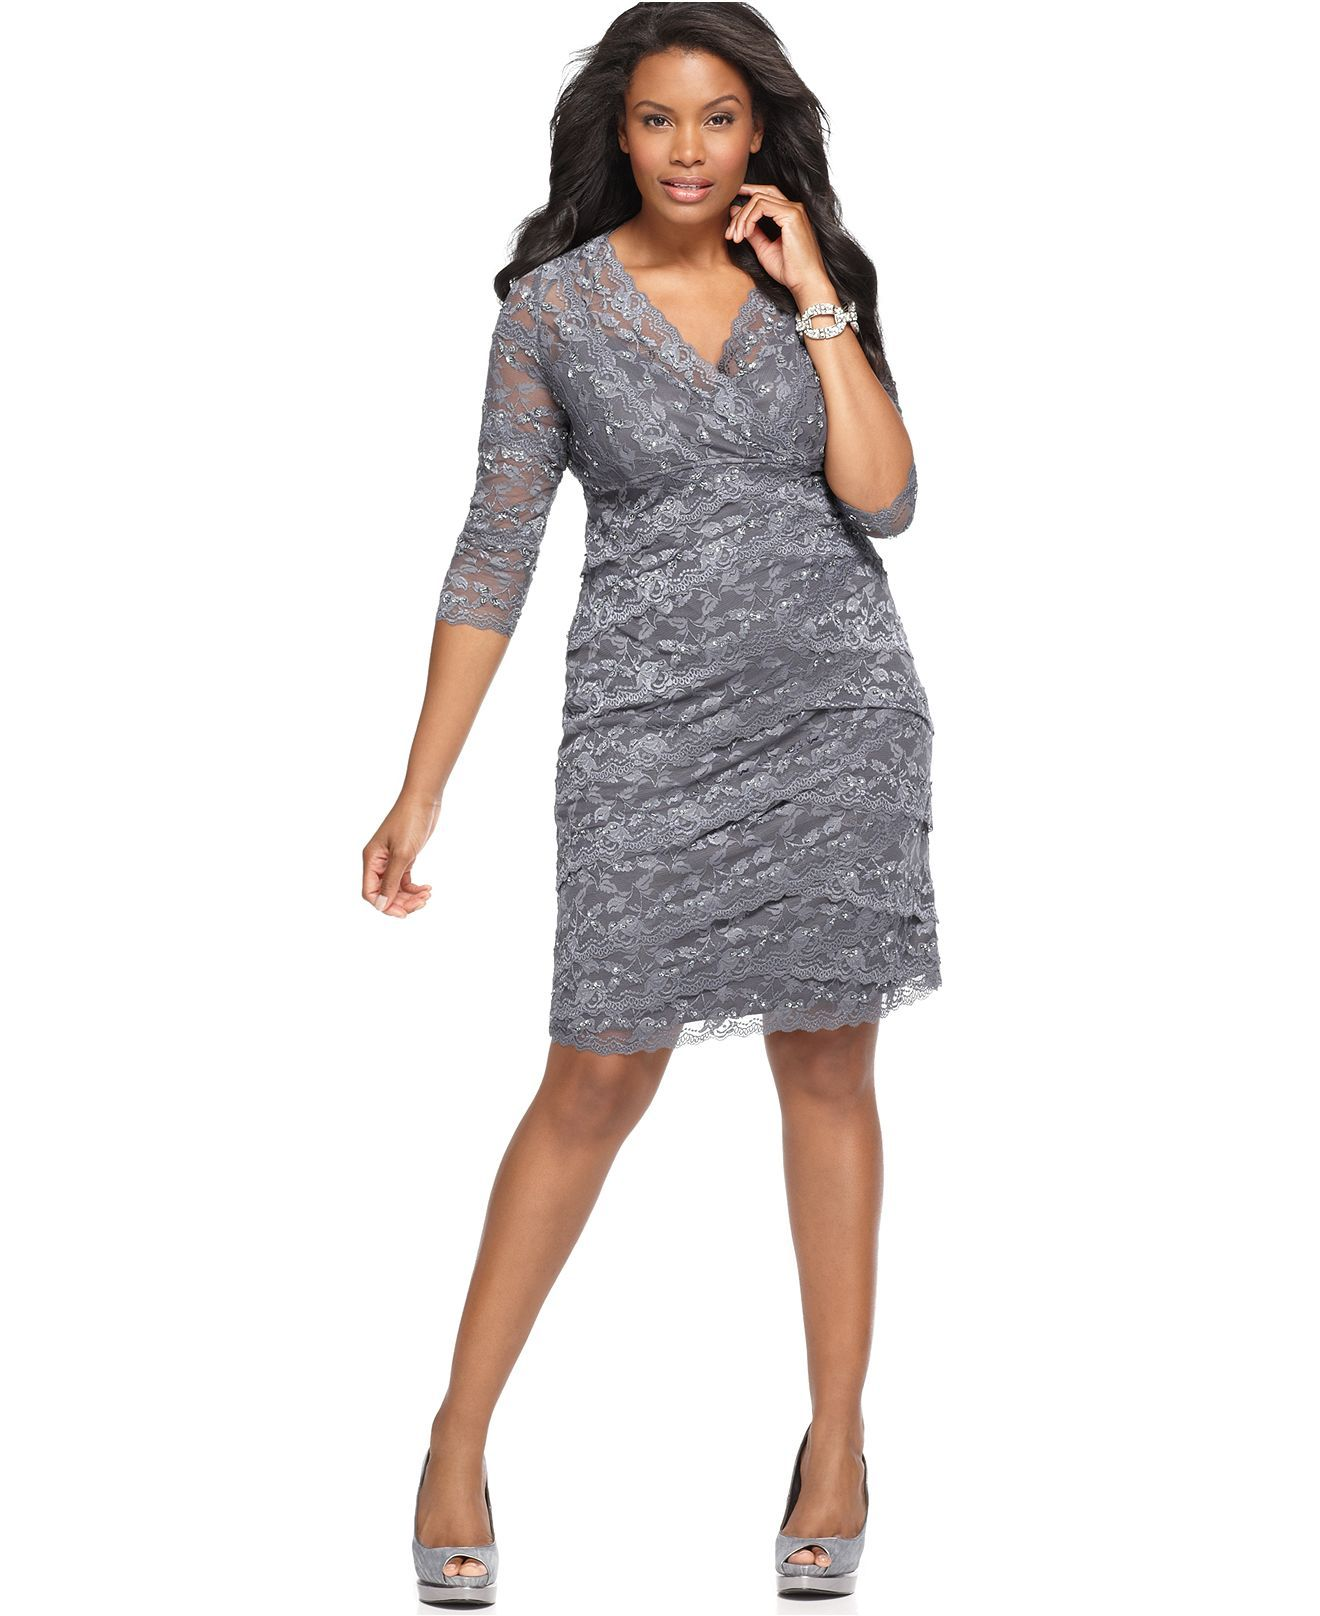 3 4 sleeve plus size dress